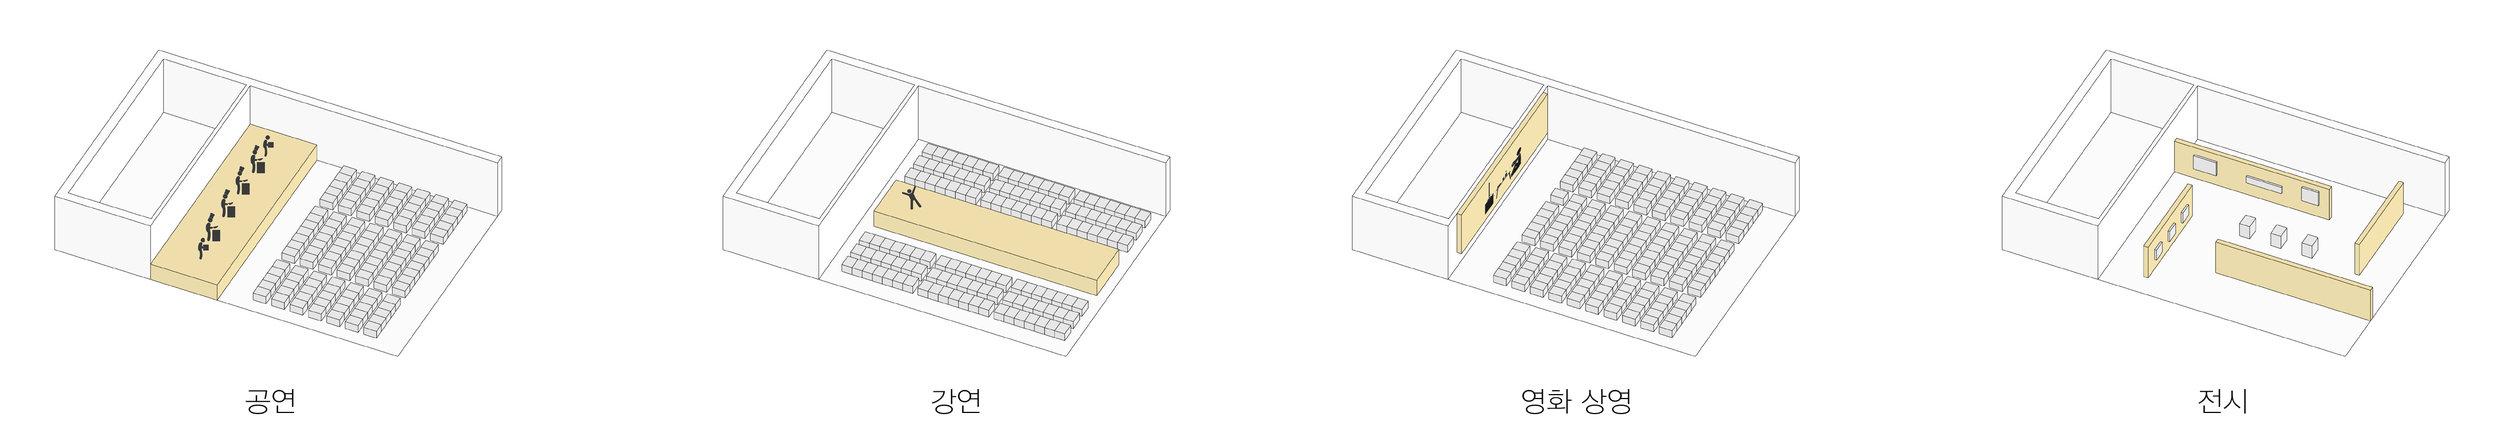 Blackbox diagram.jpg